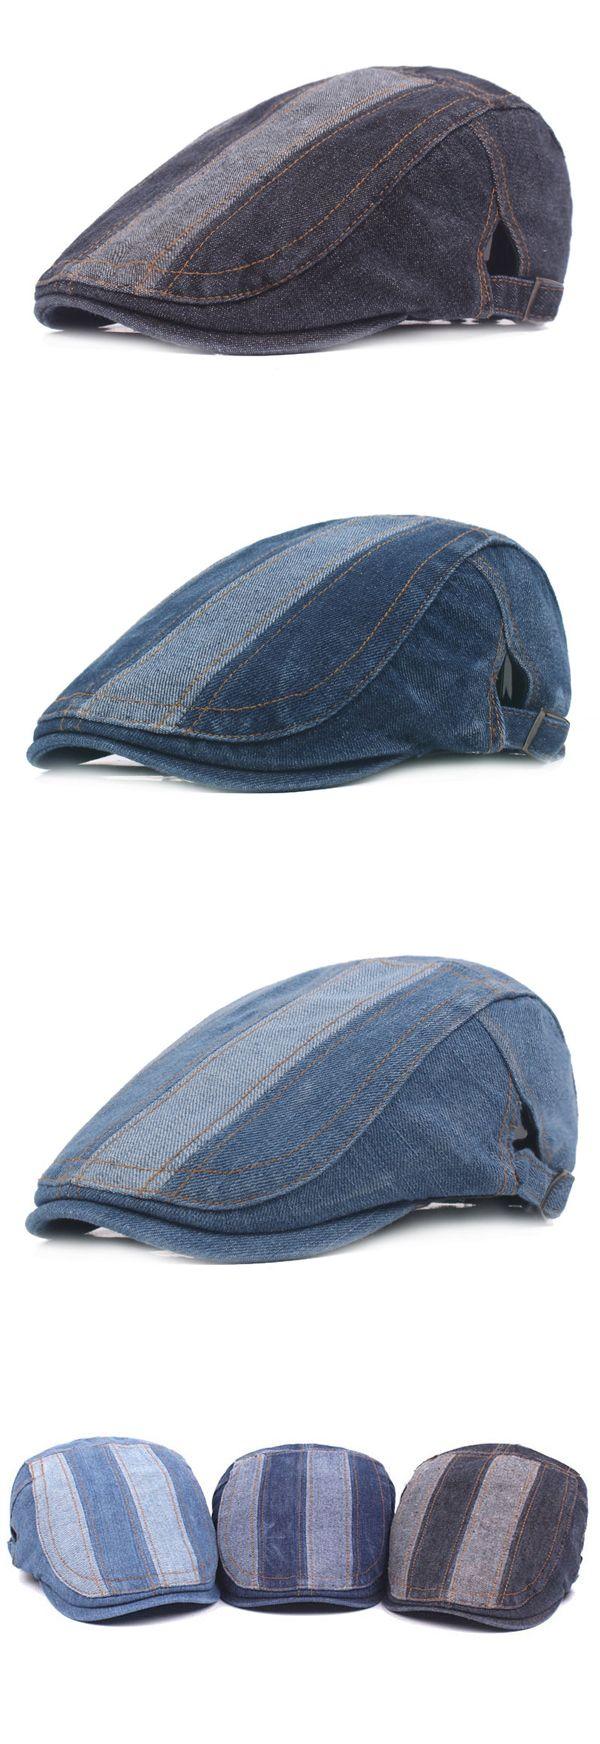 [$ 8.10]   Retro Washed Denim Beret Cap Casual Travel Sunscreen Forward Hat For Mens Women http://www.99wtf.net/men/mens-fasion/ideas-choosing-mens-outfit-colors-mens-fashion-2016/